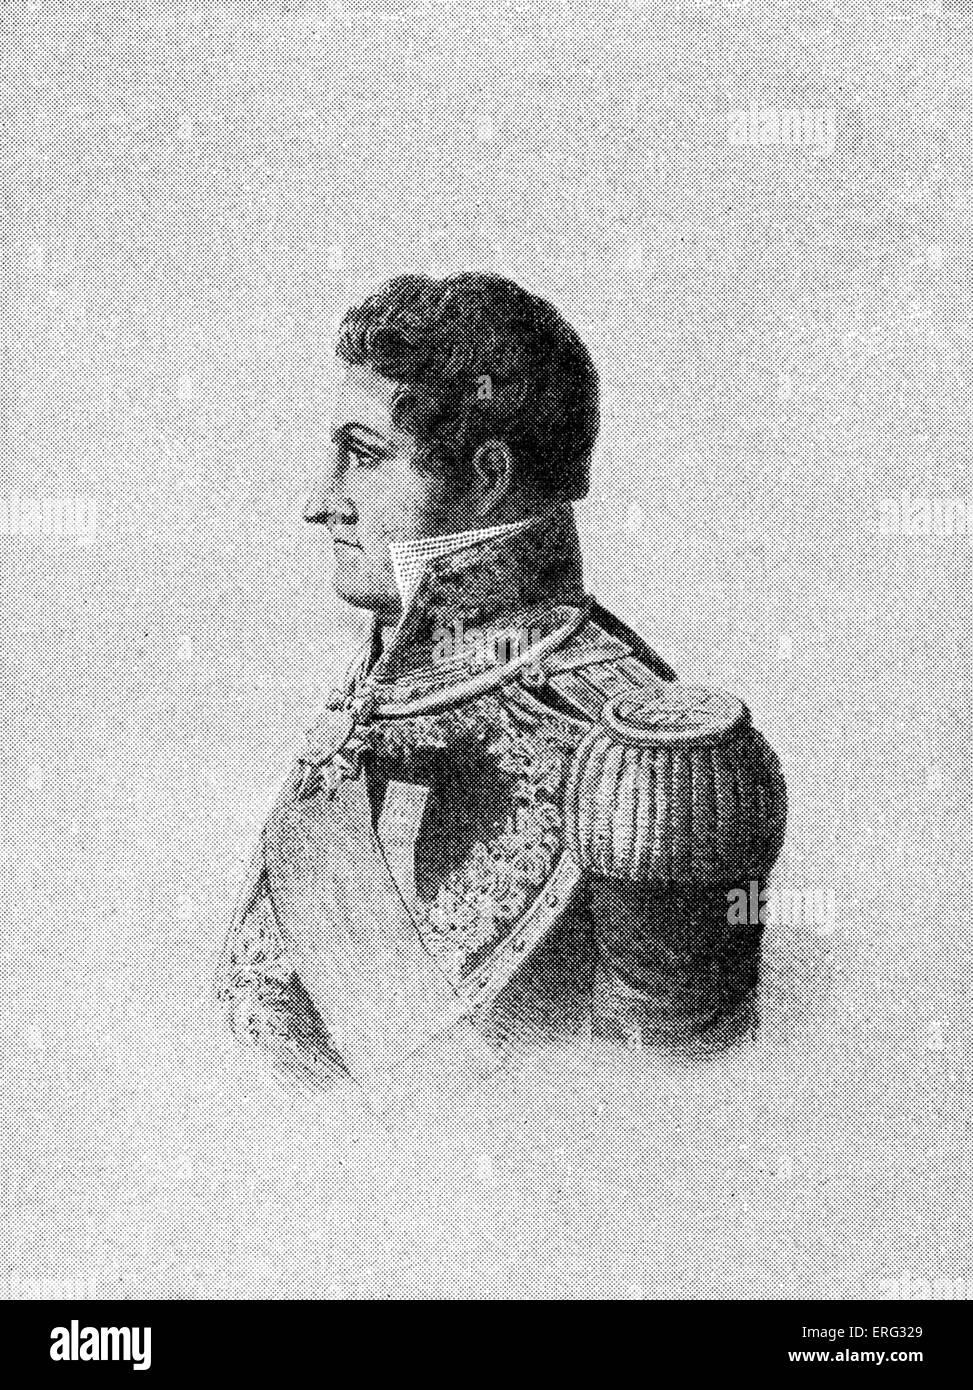 General Simon Bolivar, Venezuelan military commander and  liberator of South America  24 July 1783 - 17 December - Stock Image